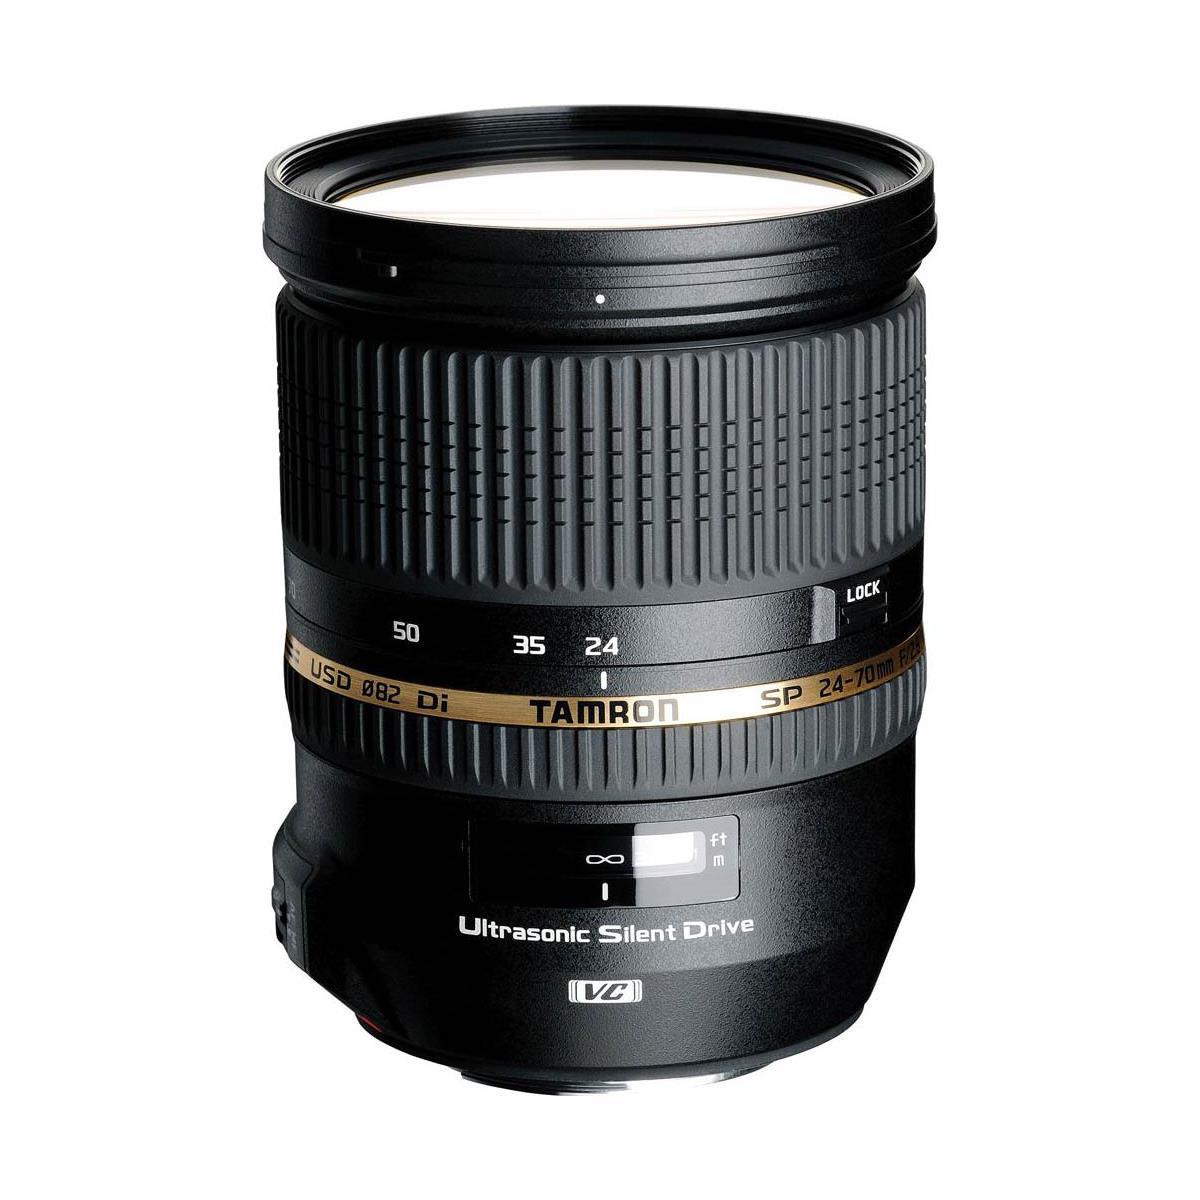 Tamron SP 24-70mm f/2.8 Di VC USD Lens (canon or nikon) $899 + free s/h